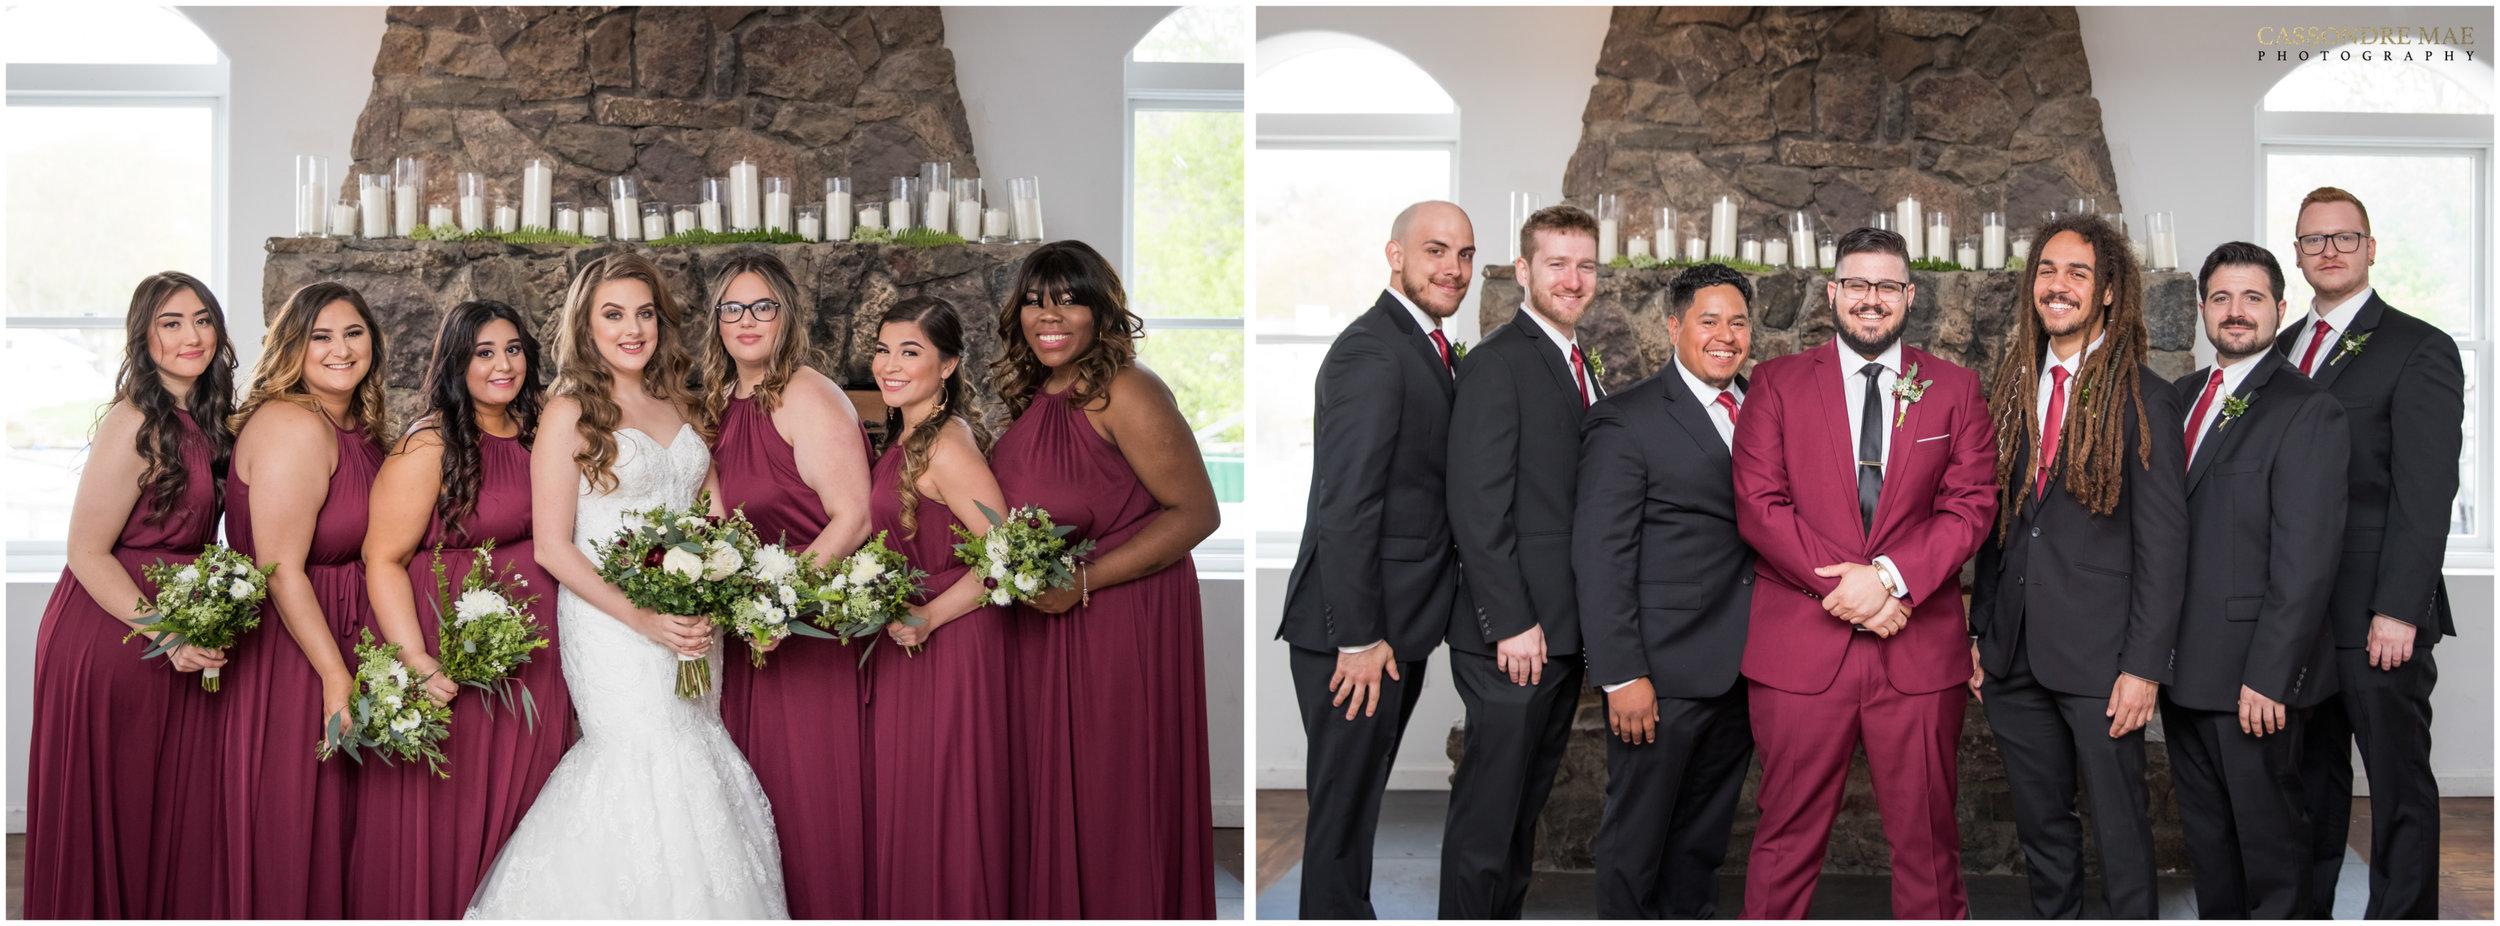 Cassondre Mae Photography Cove Castle Weddings 25.jpg